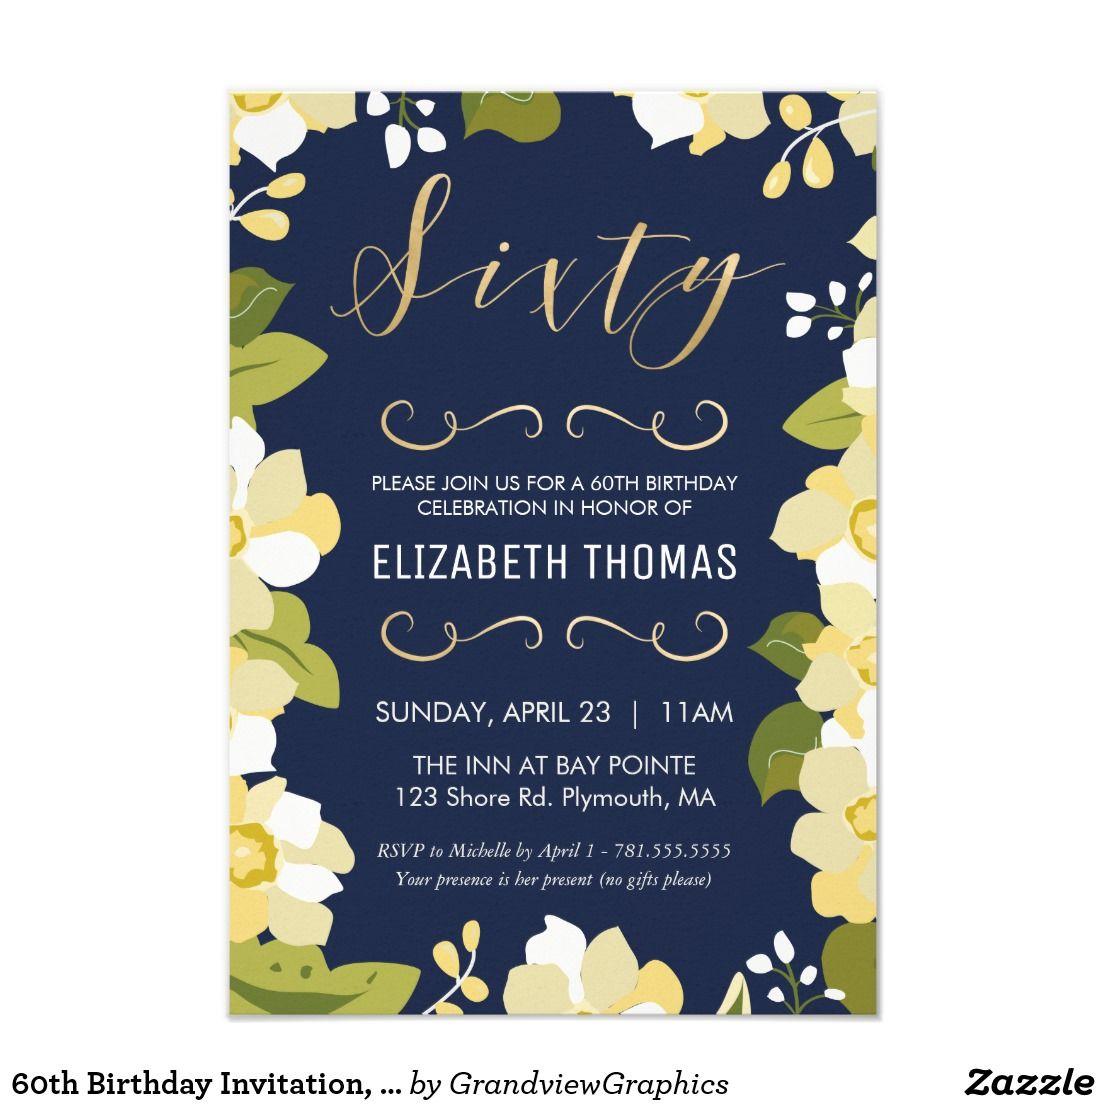 60th Birthday Invitation Customize Floral W Gold